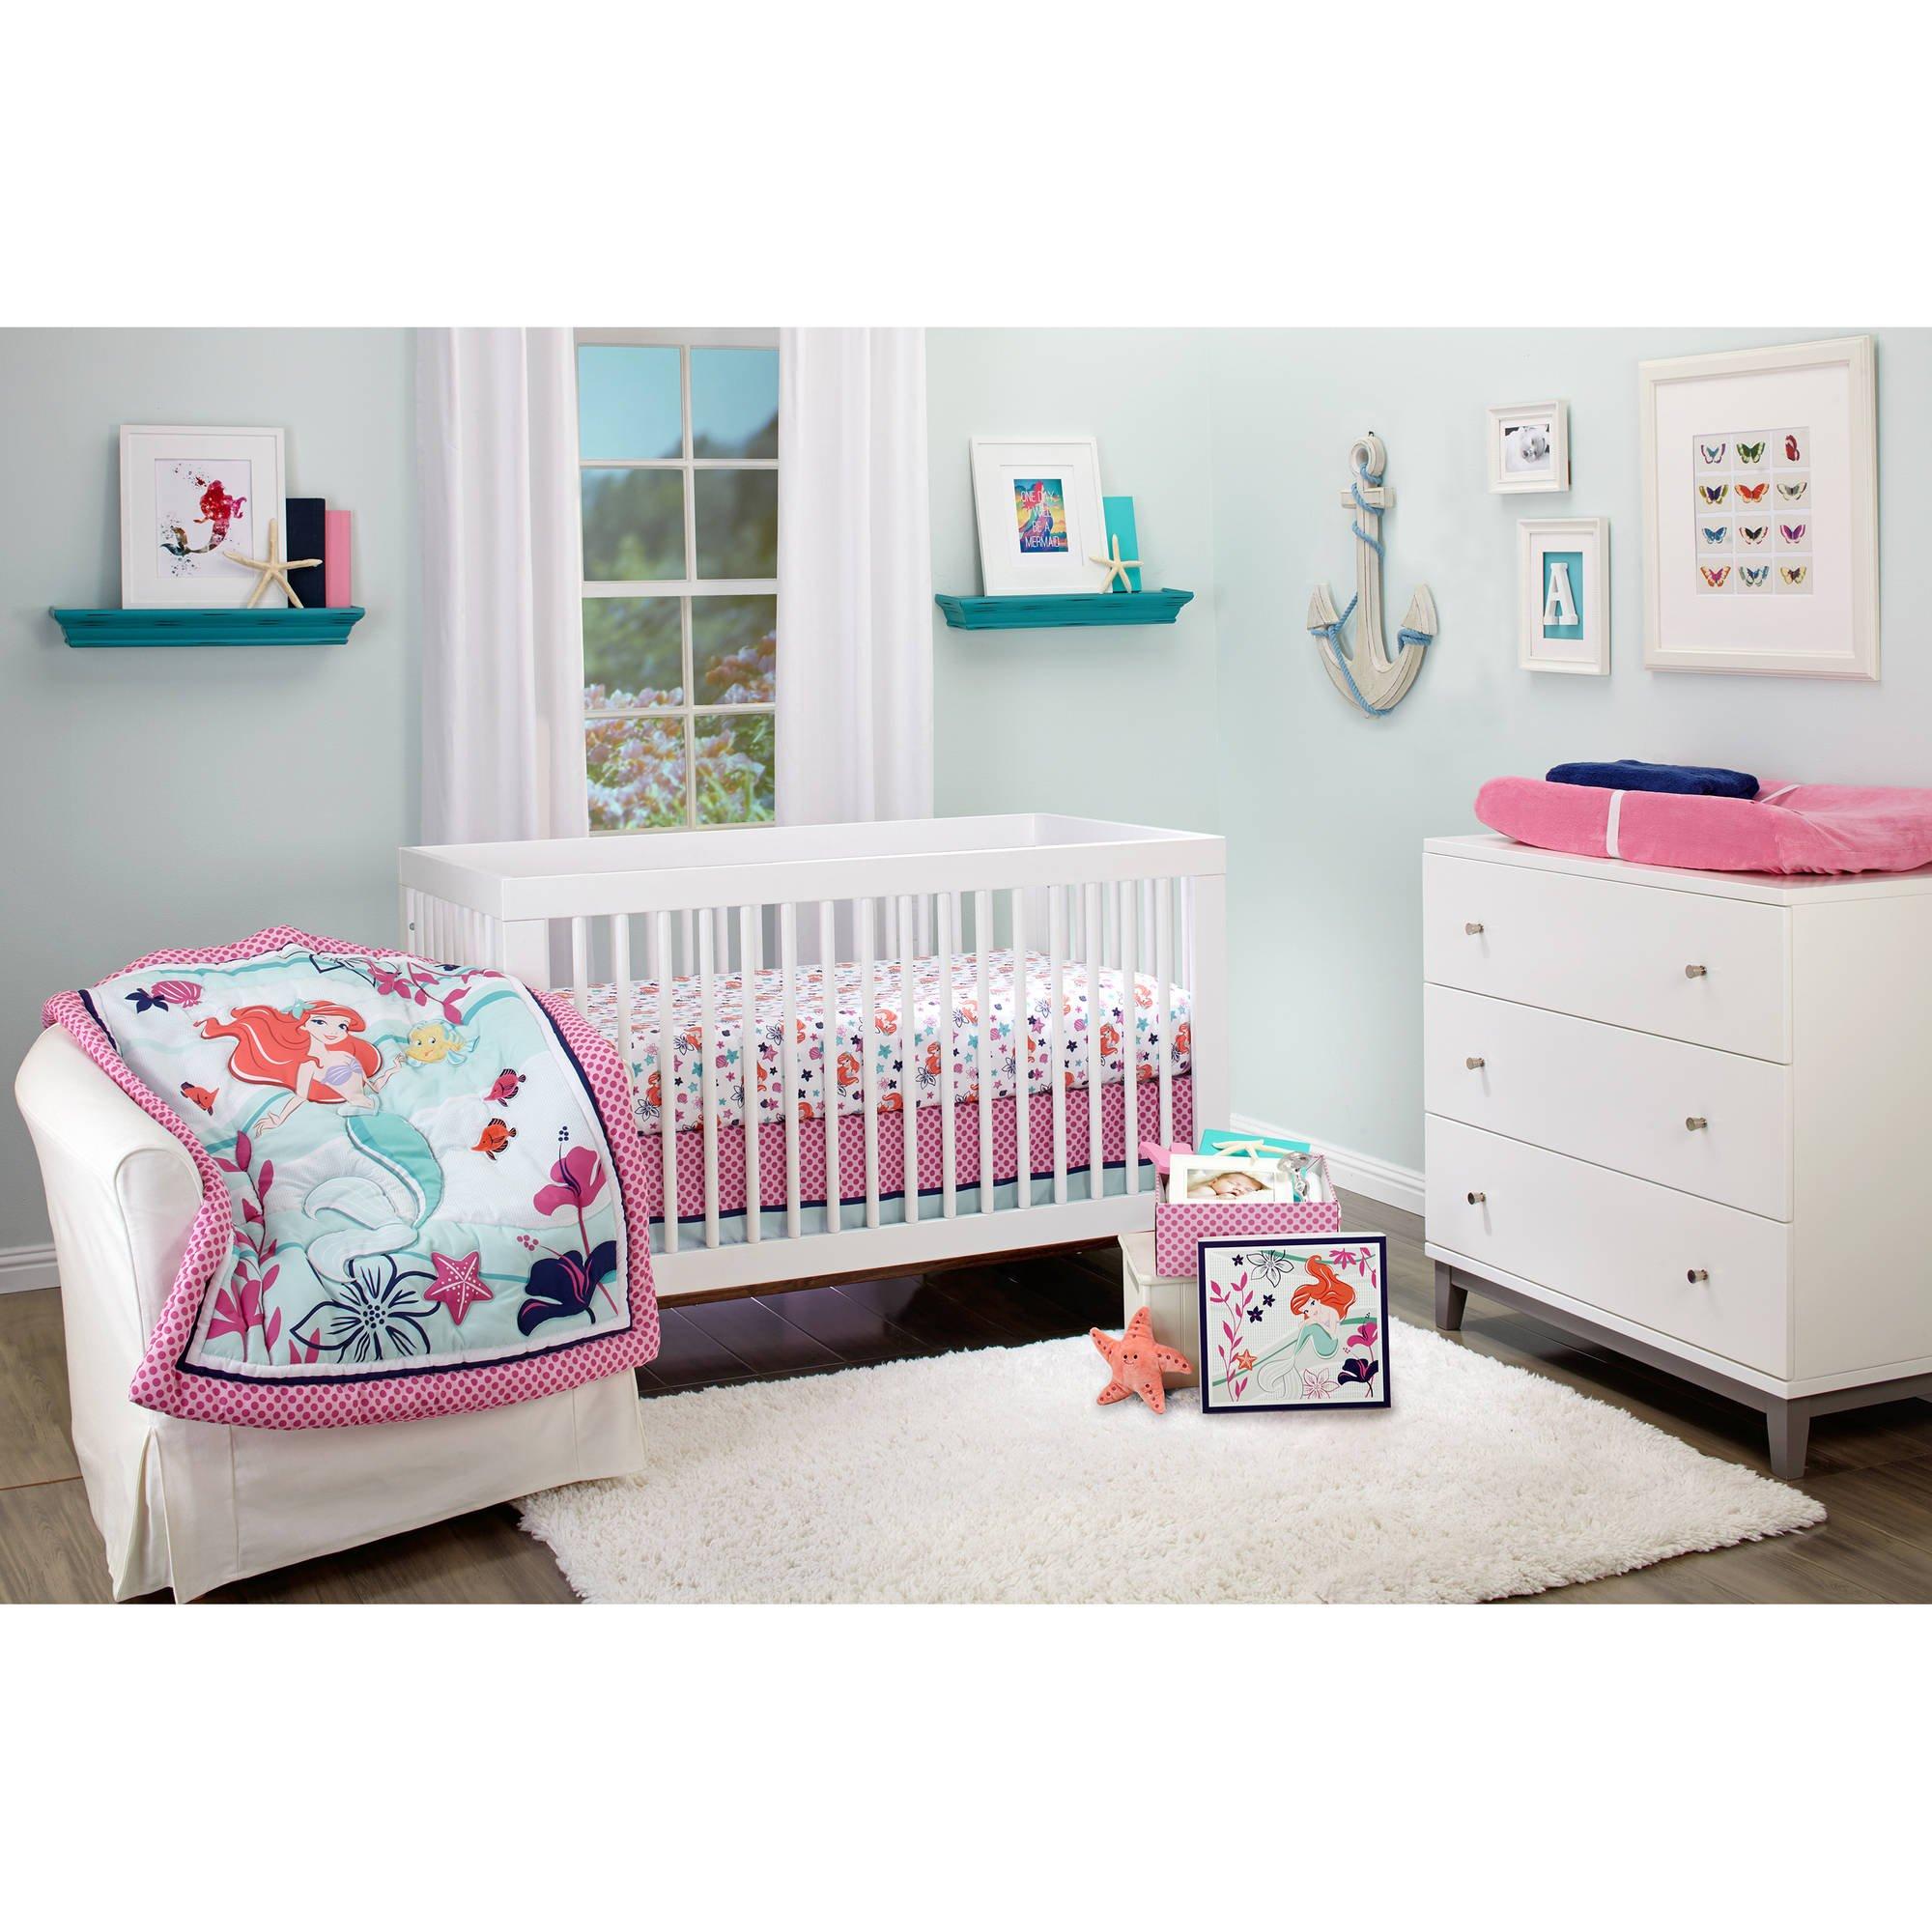 d8eaba28e59c20 Get Quotations · Disney Ariel Sea Treasures 4-Piece Crib Bedding Set W  keepsake box - Little Mermaid